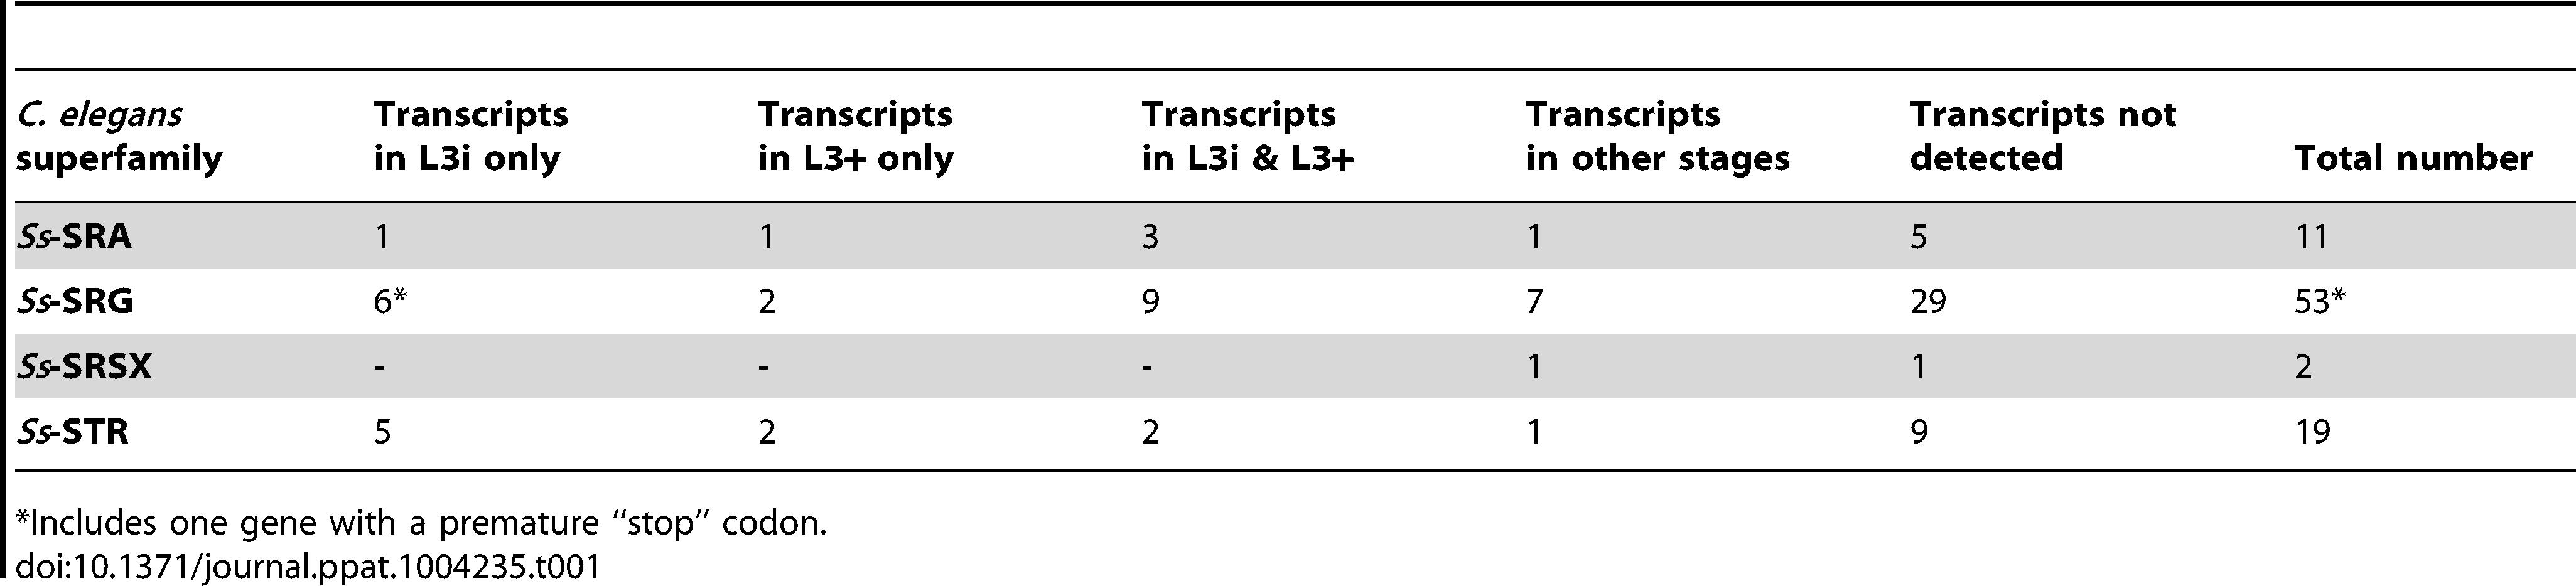 Transcript abundance of <i>S. stercoralis</i> homologs of <i>C. elegans</i> chemosensory 7TM GPCRs.